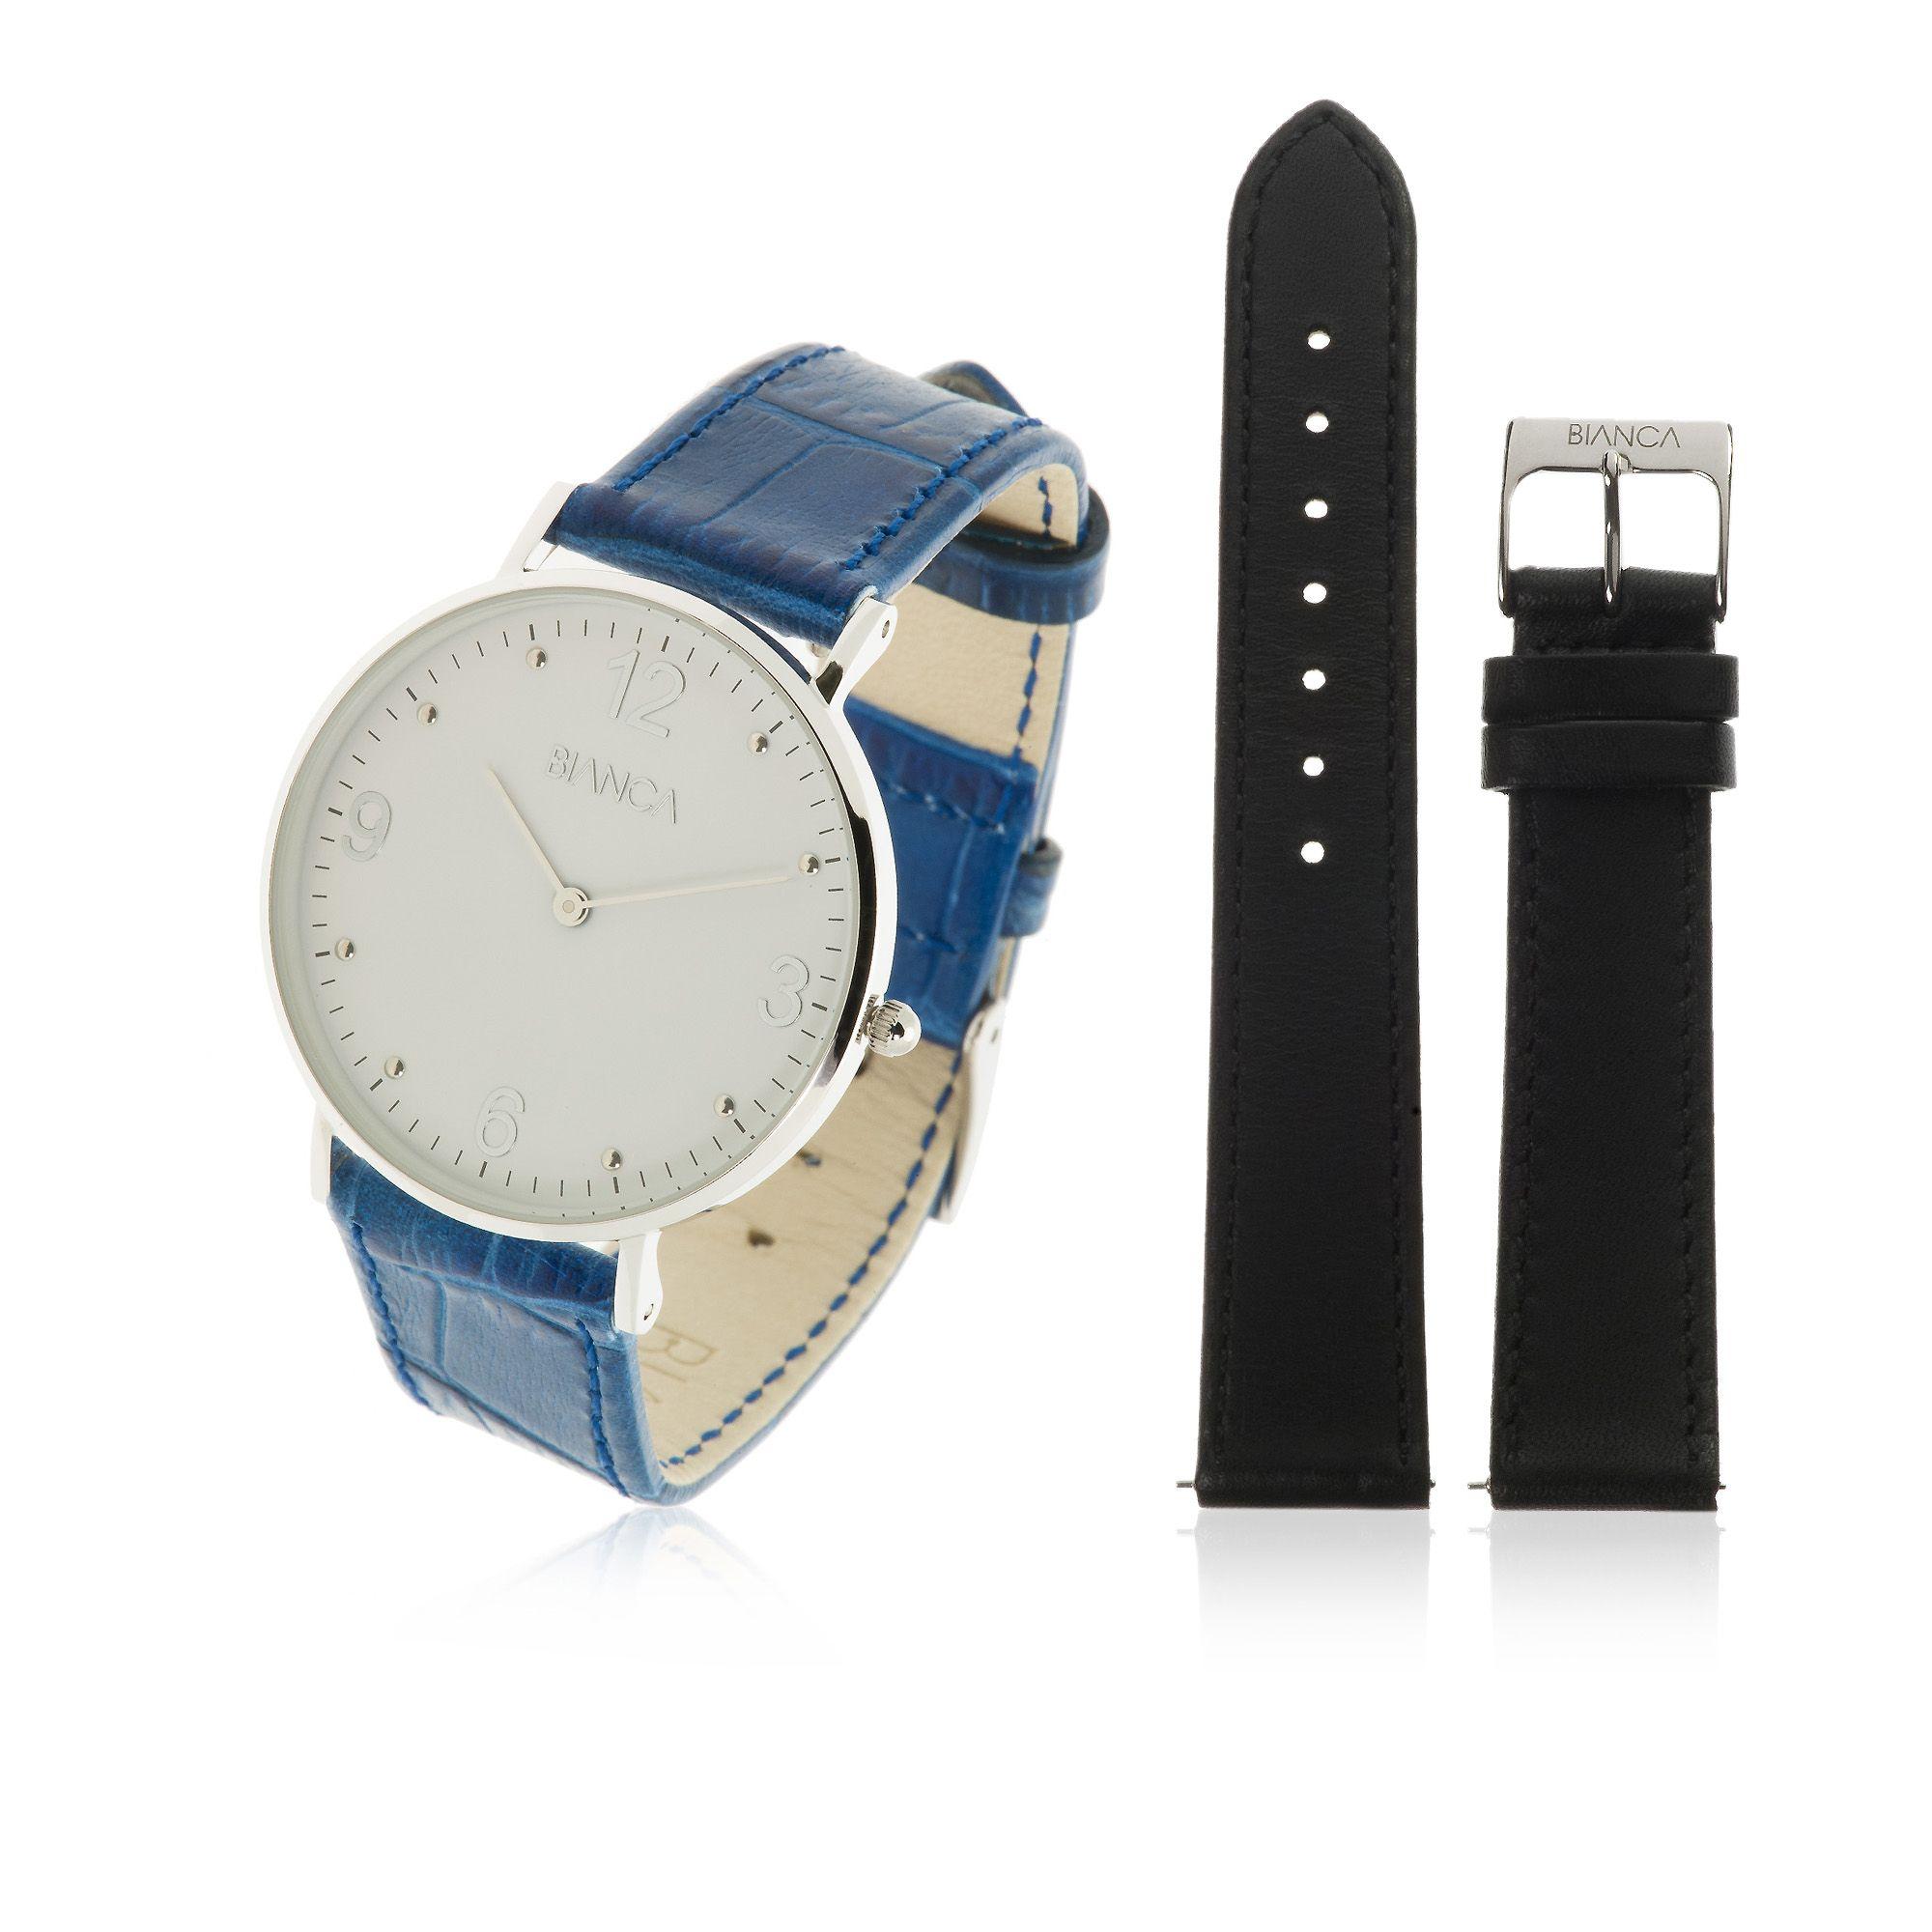 orologi bianca italia